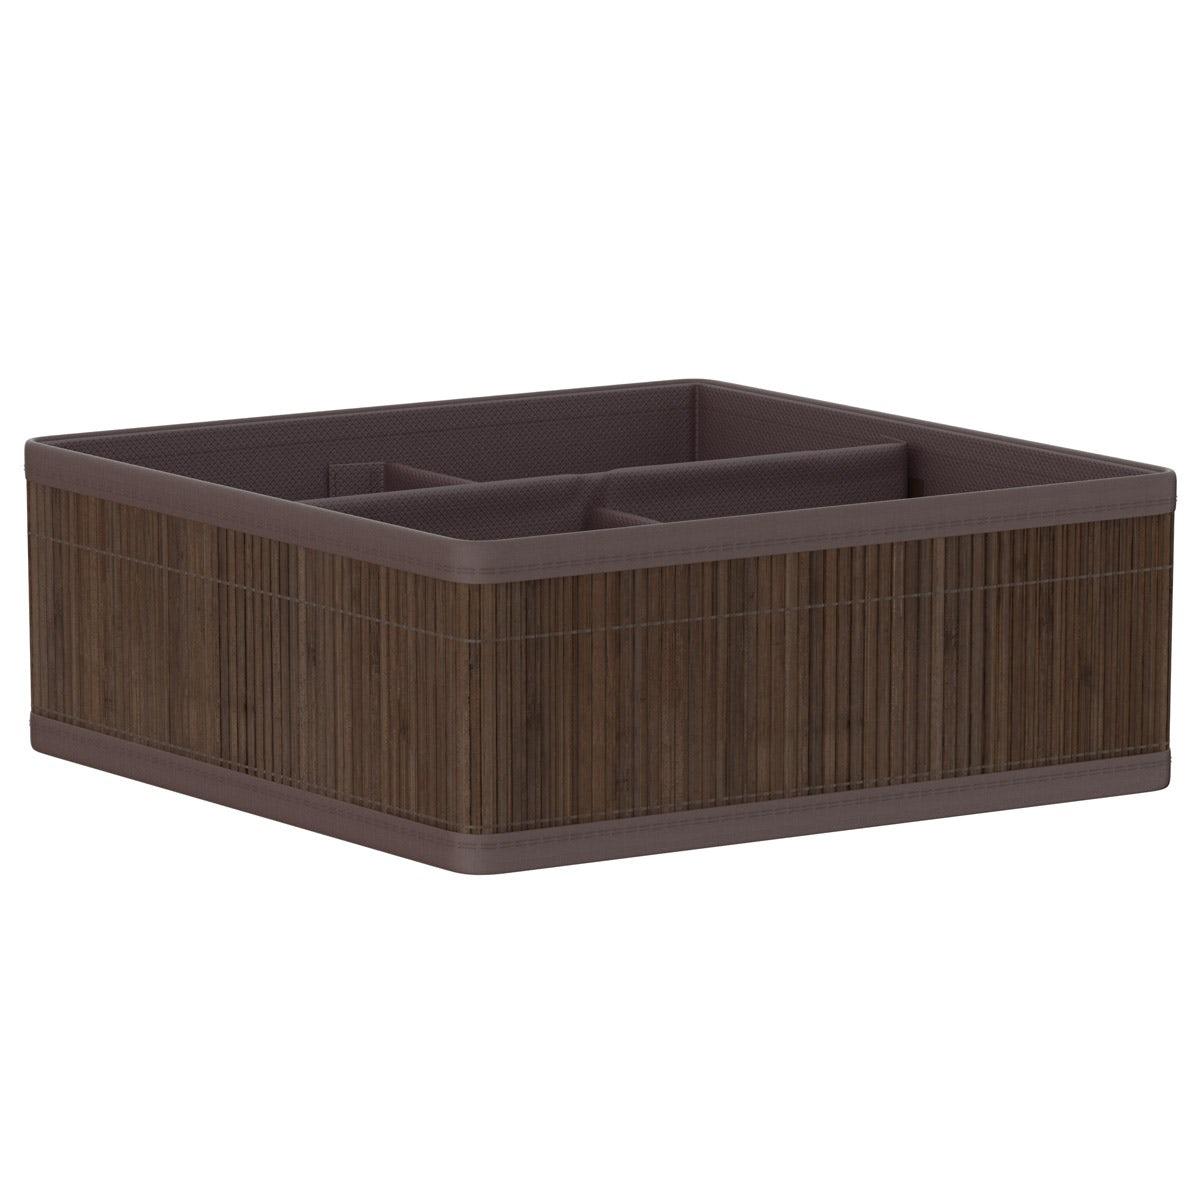 Natural bamboo 4 section dark brown storage basket